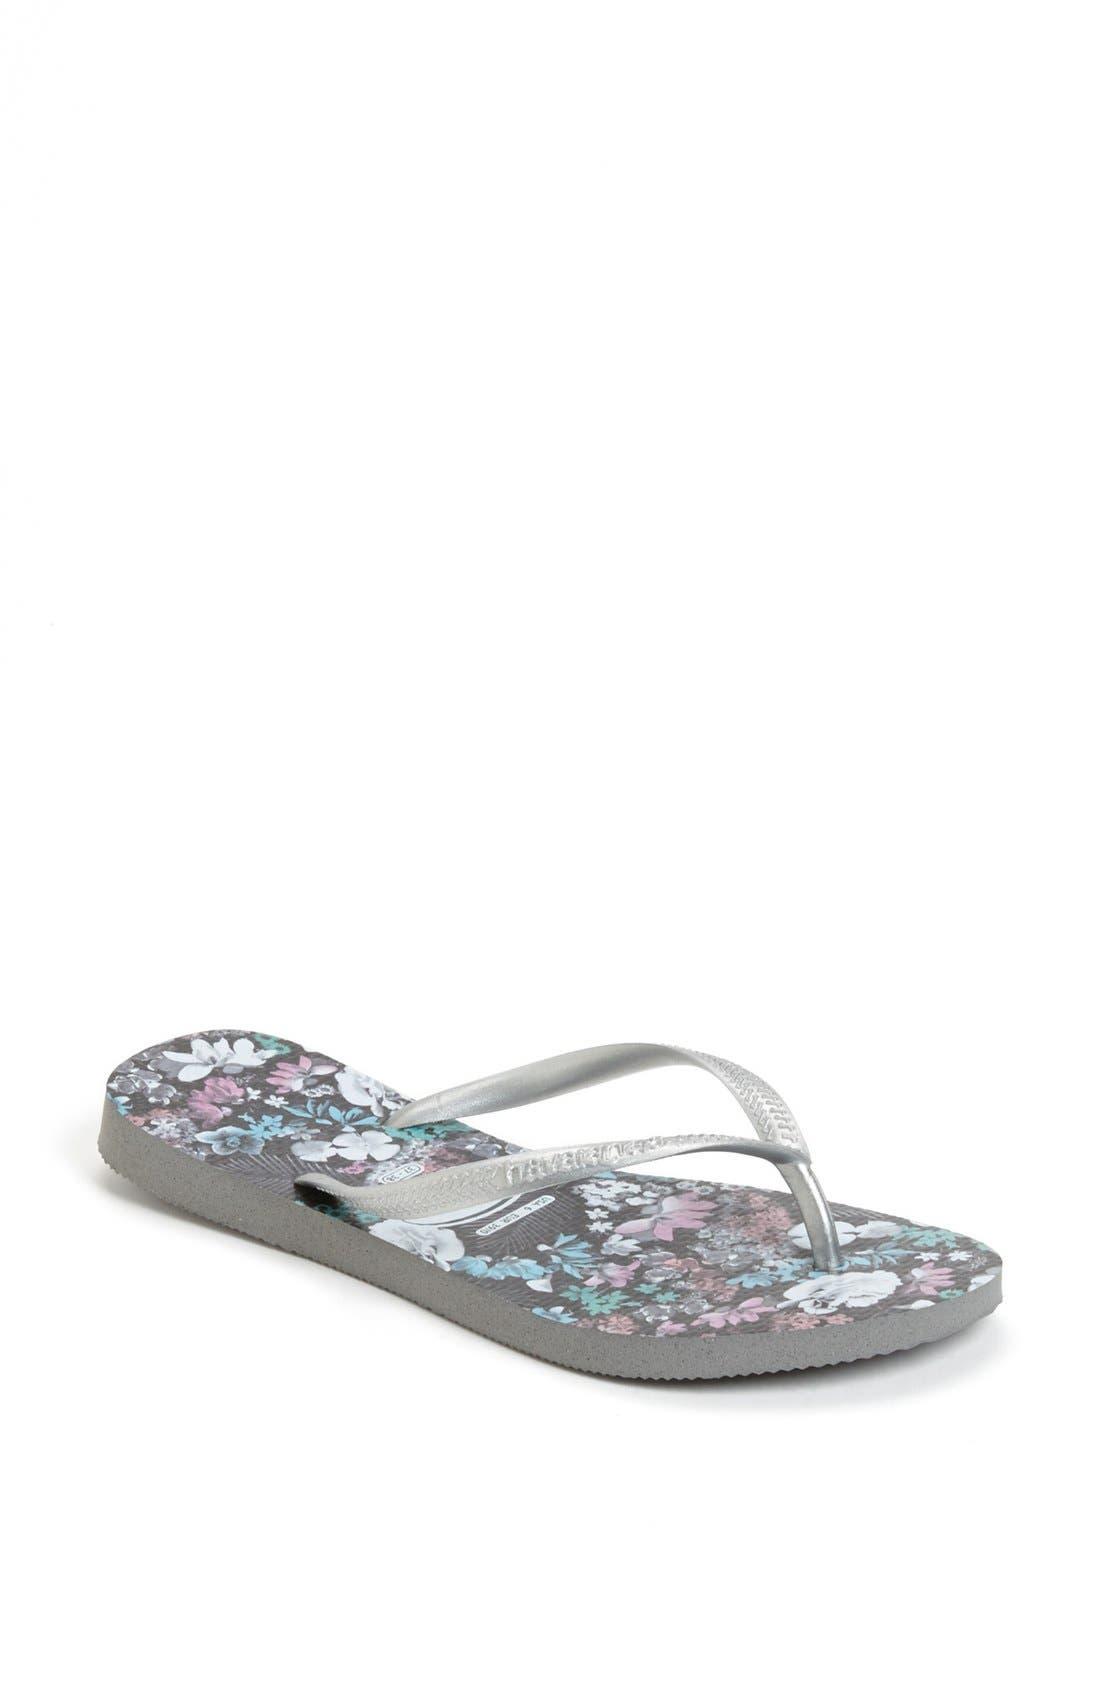 Main Image - Havaianas 'Slim Floral' Flip Flop (Women)